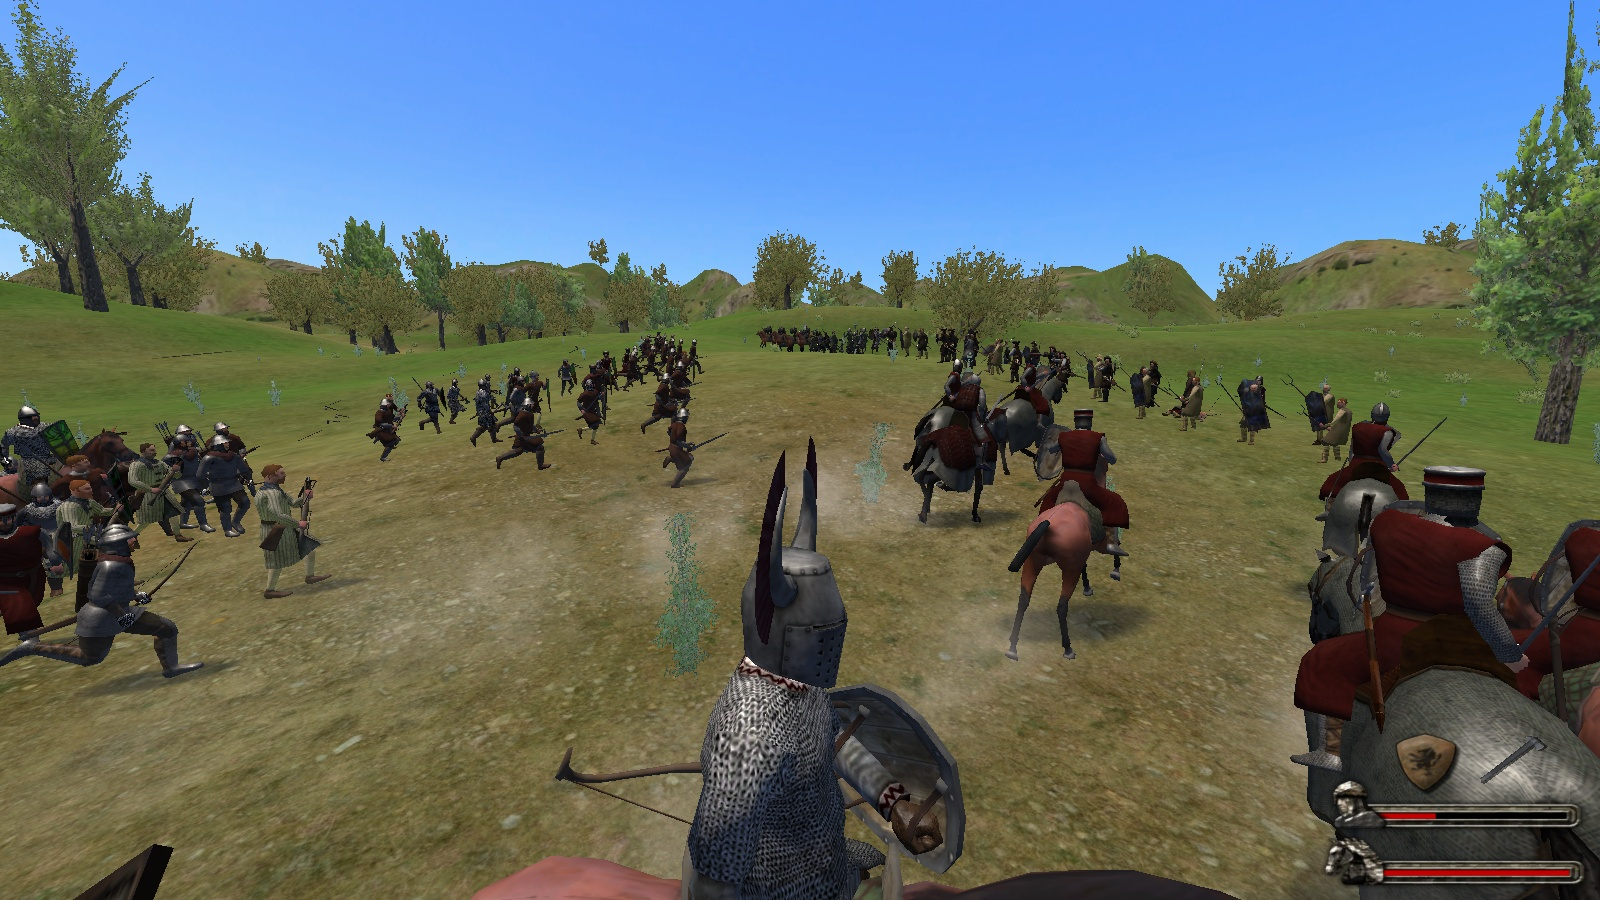 Mount and blade mods freelancer freelancer rebirth 2014